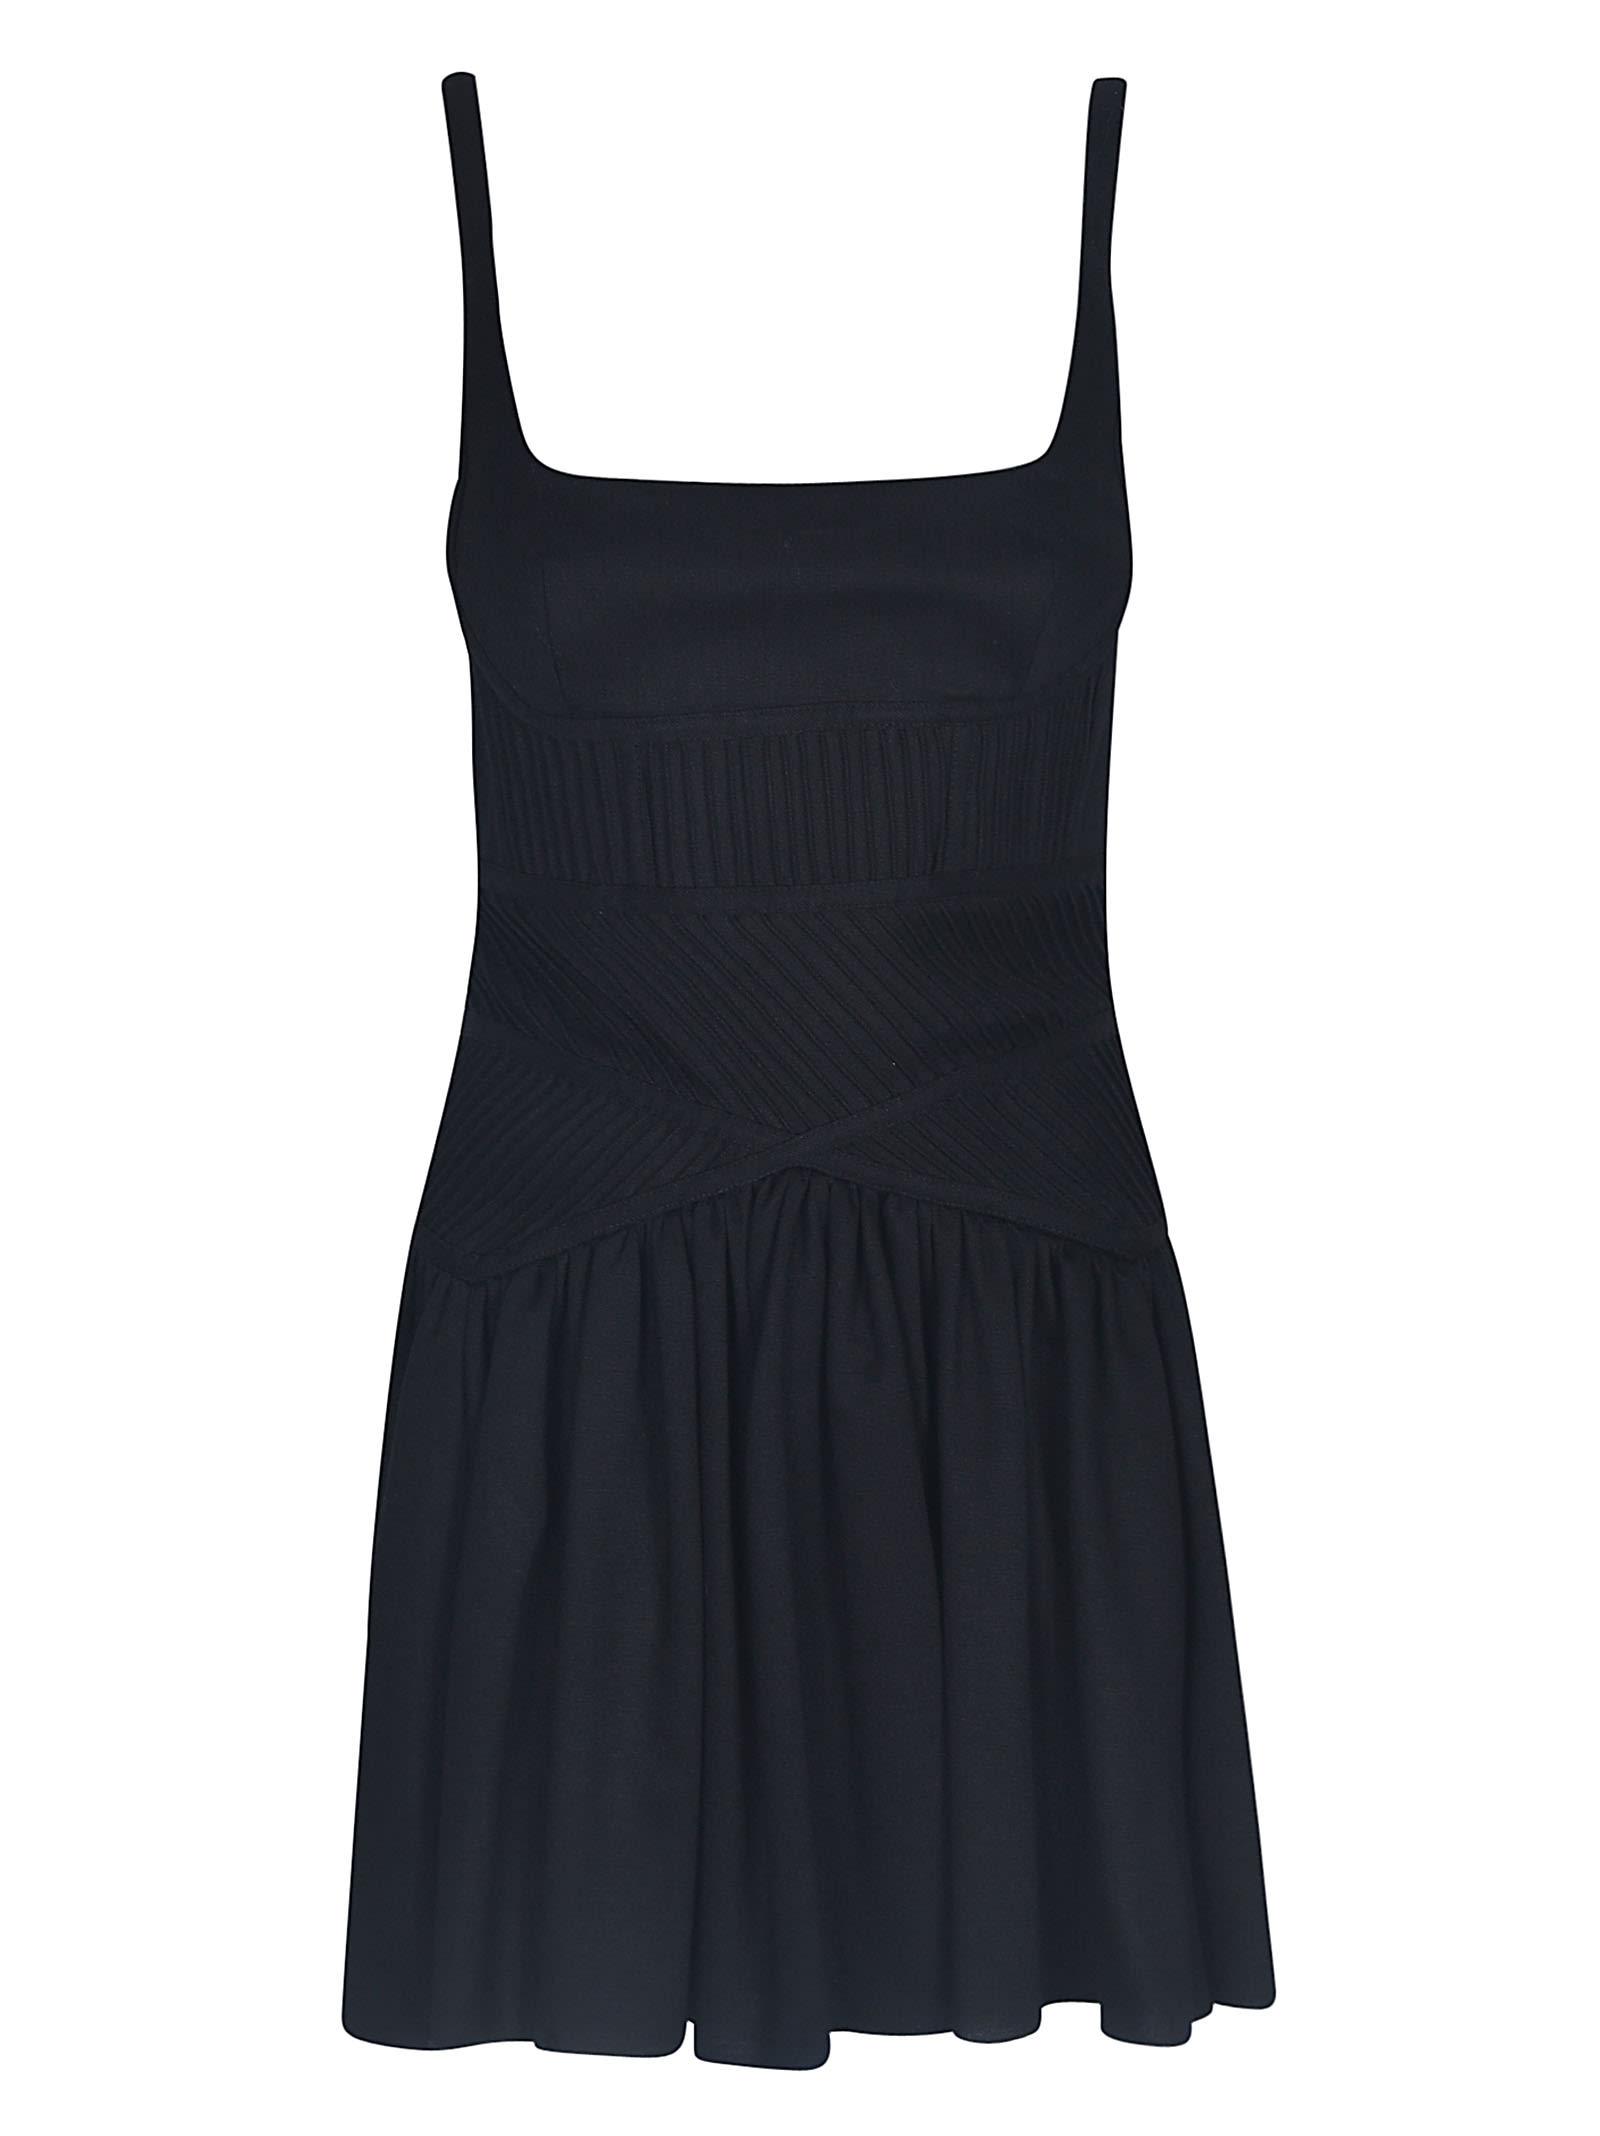 Buy Giovanni Bedin Short Back Zipped Dress online, shop Giovanni Bedin with free shipping